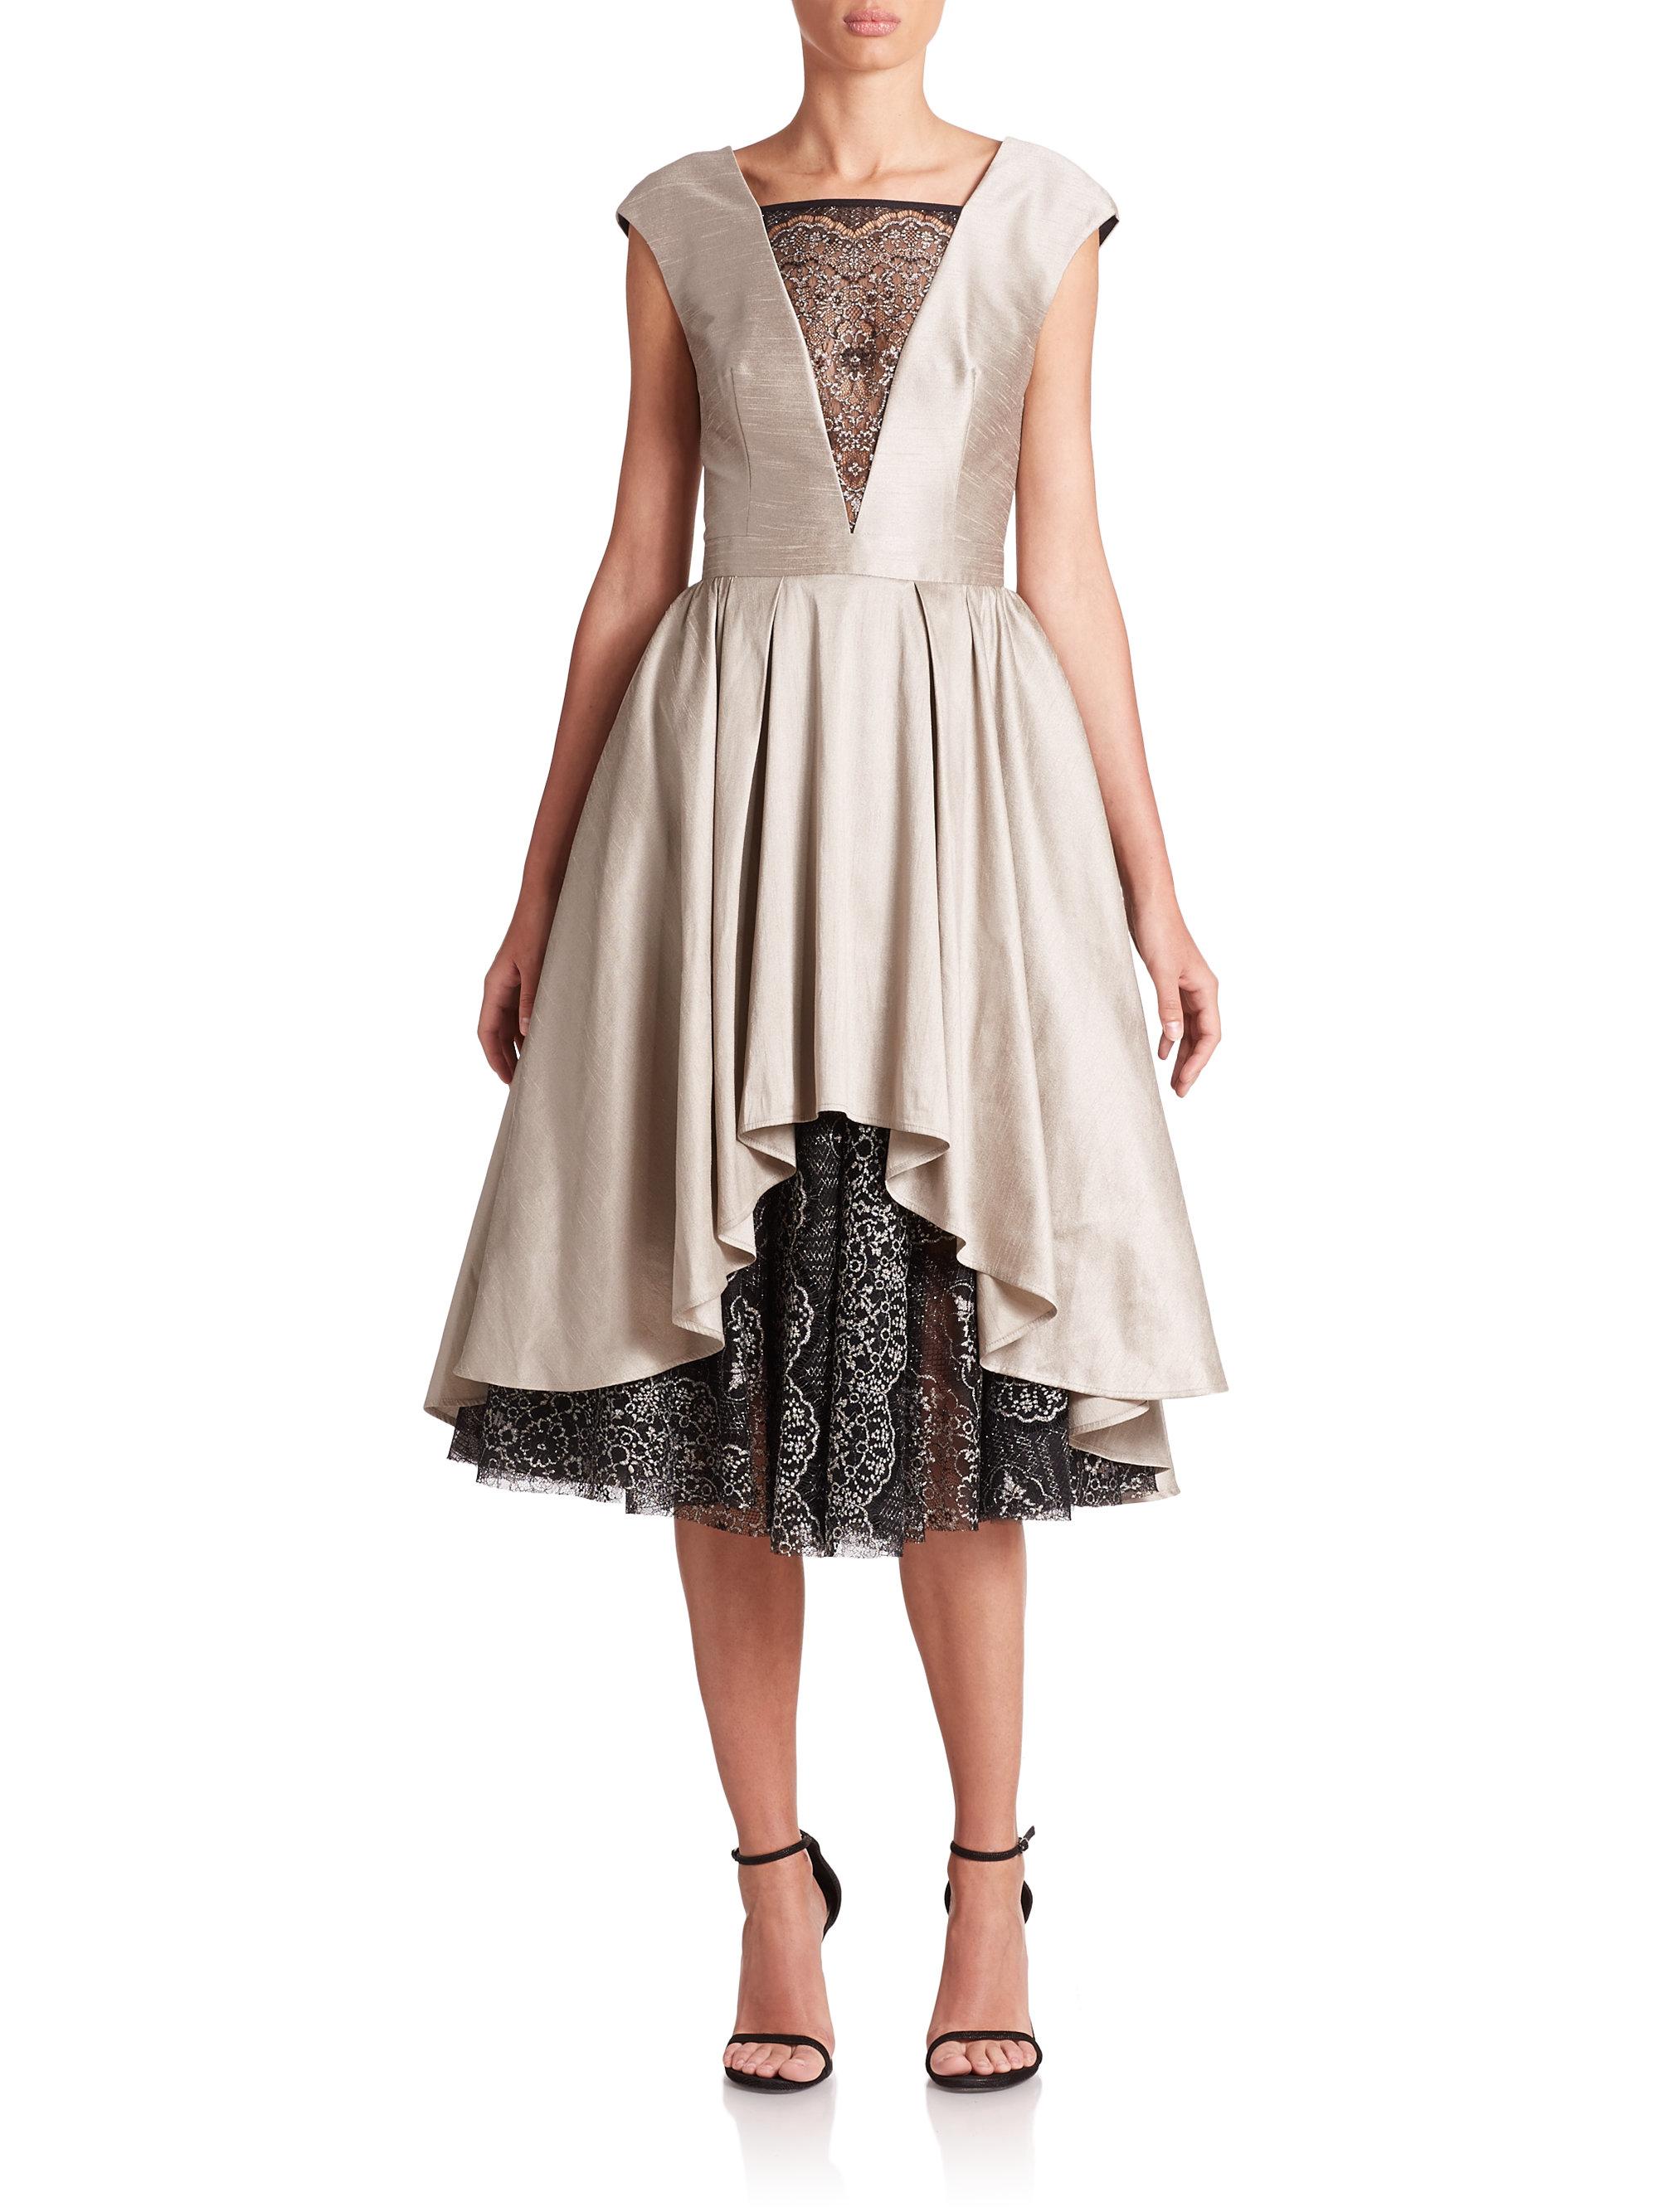 Lyst - Abs By Allen Schwartz Satin & Lace Cocktail Dress in Natural